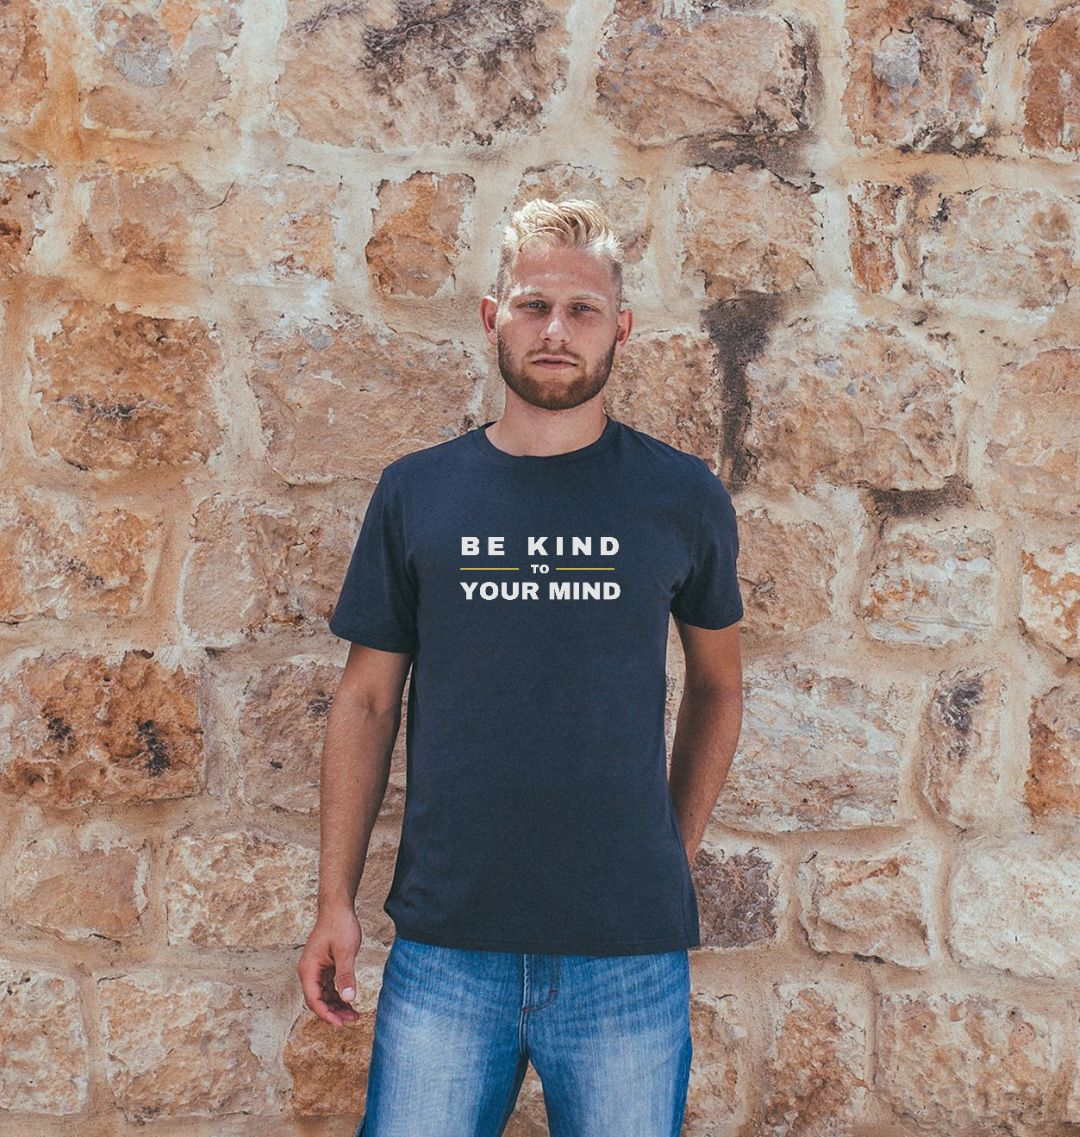 BE KIND TO YOUR MIND Mens Women's Unisex Mental Health T-shirt Top – Organic Cotton, Vegan Kind Shop 4